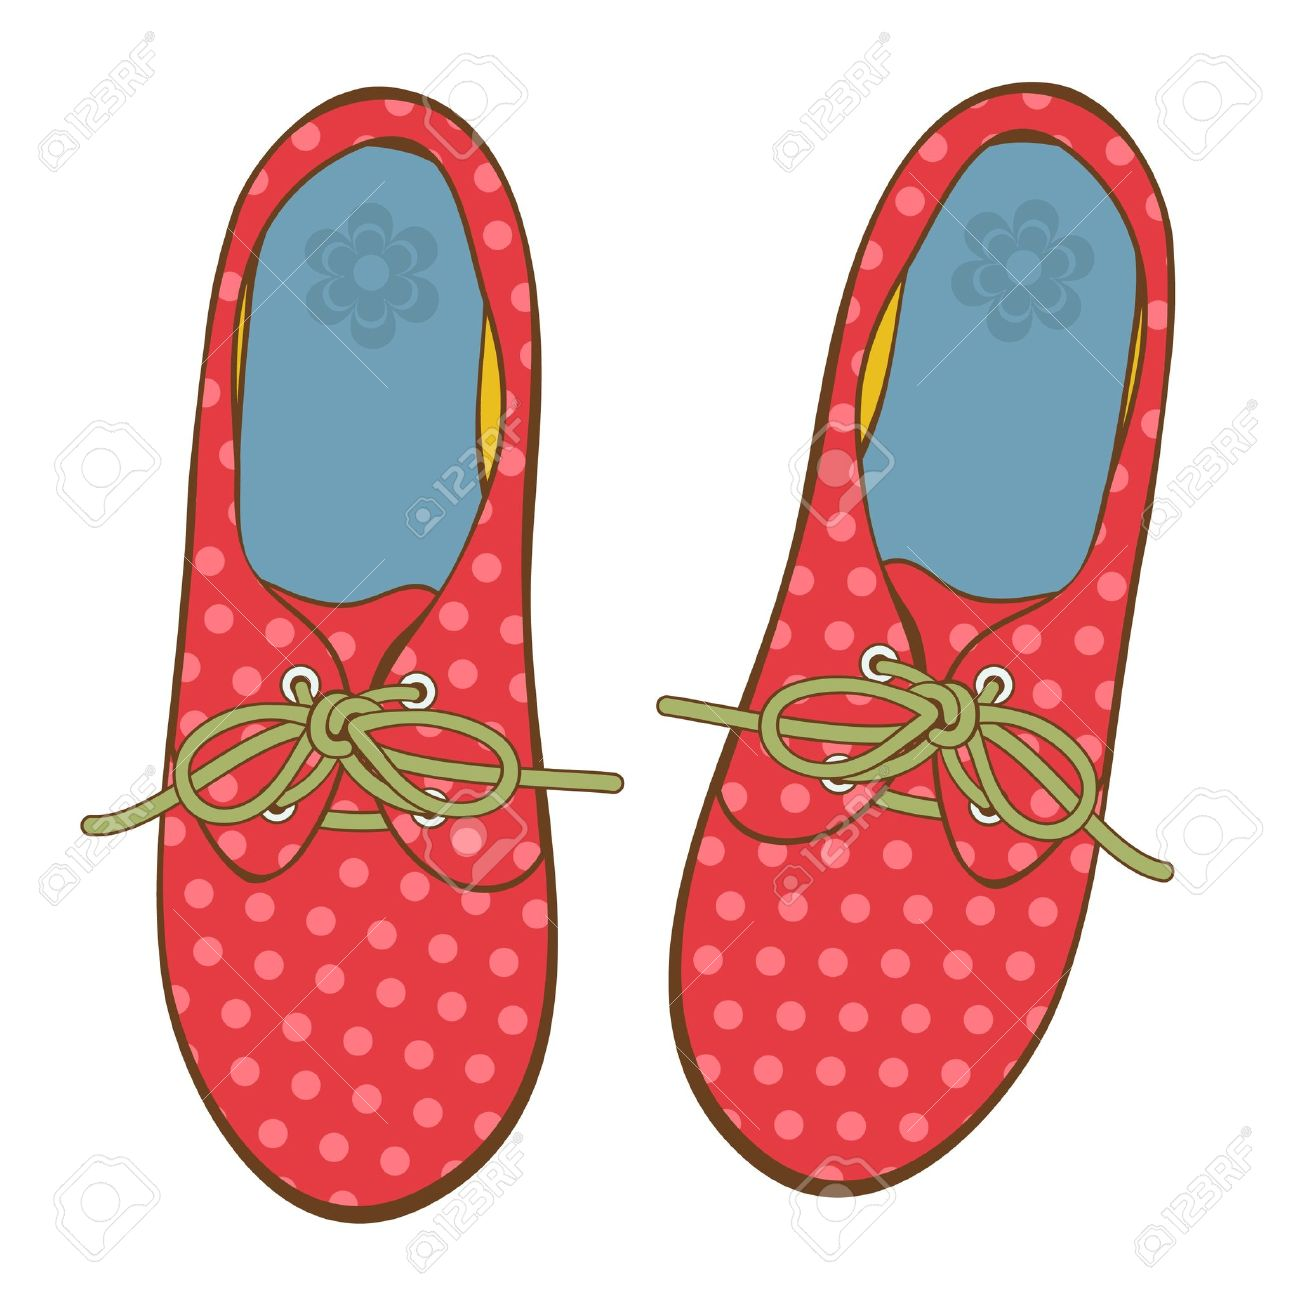 Girl Shoes Clipart Girl Shoes Elegant Polka Dot